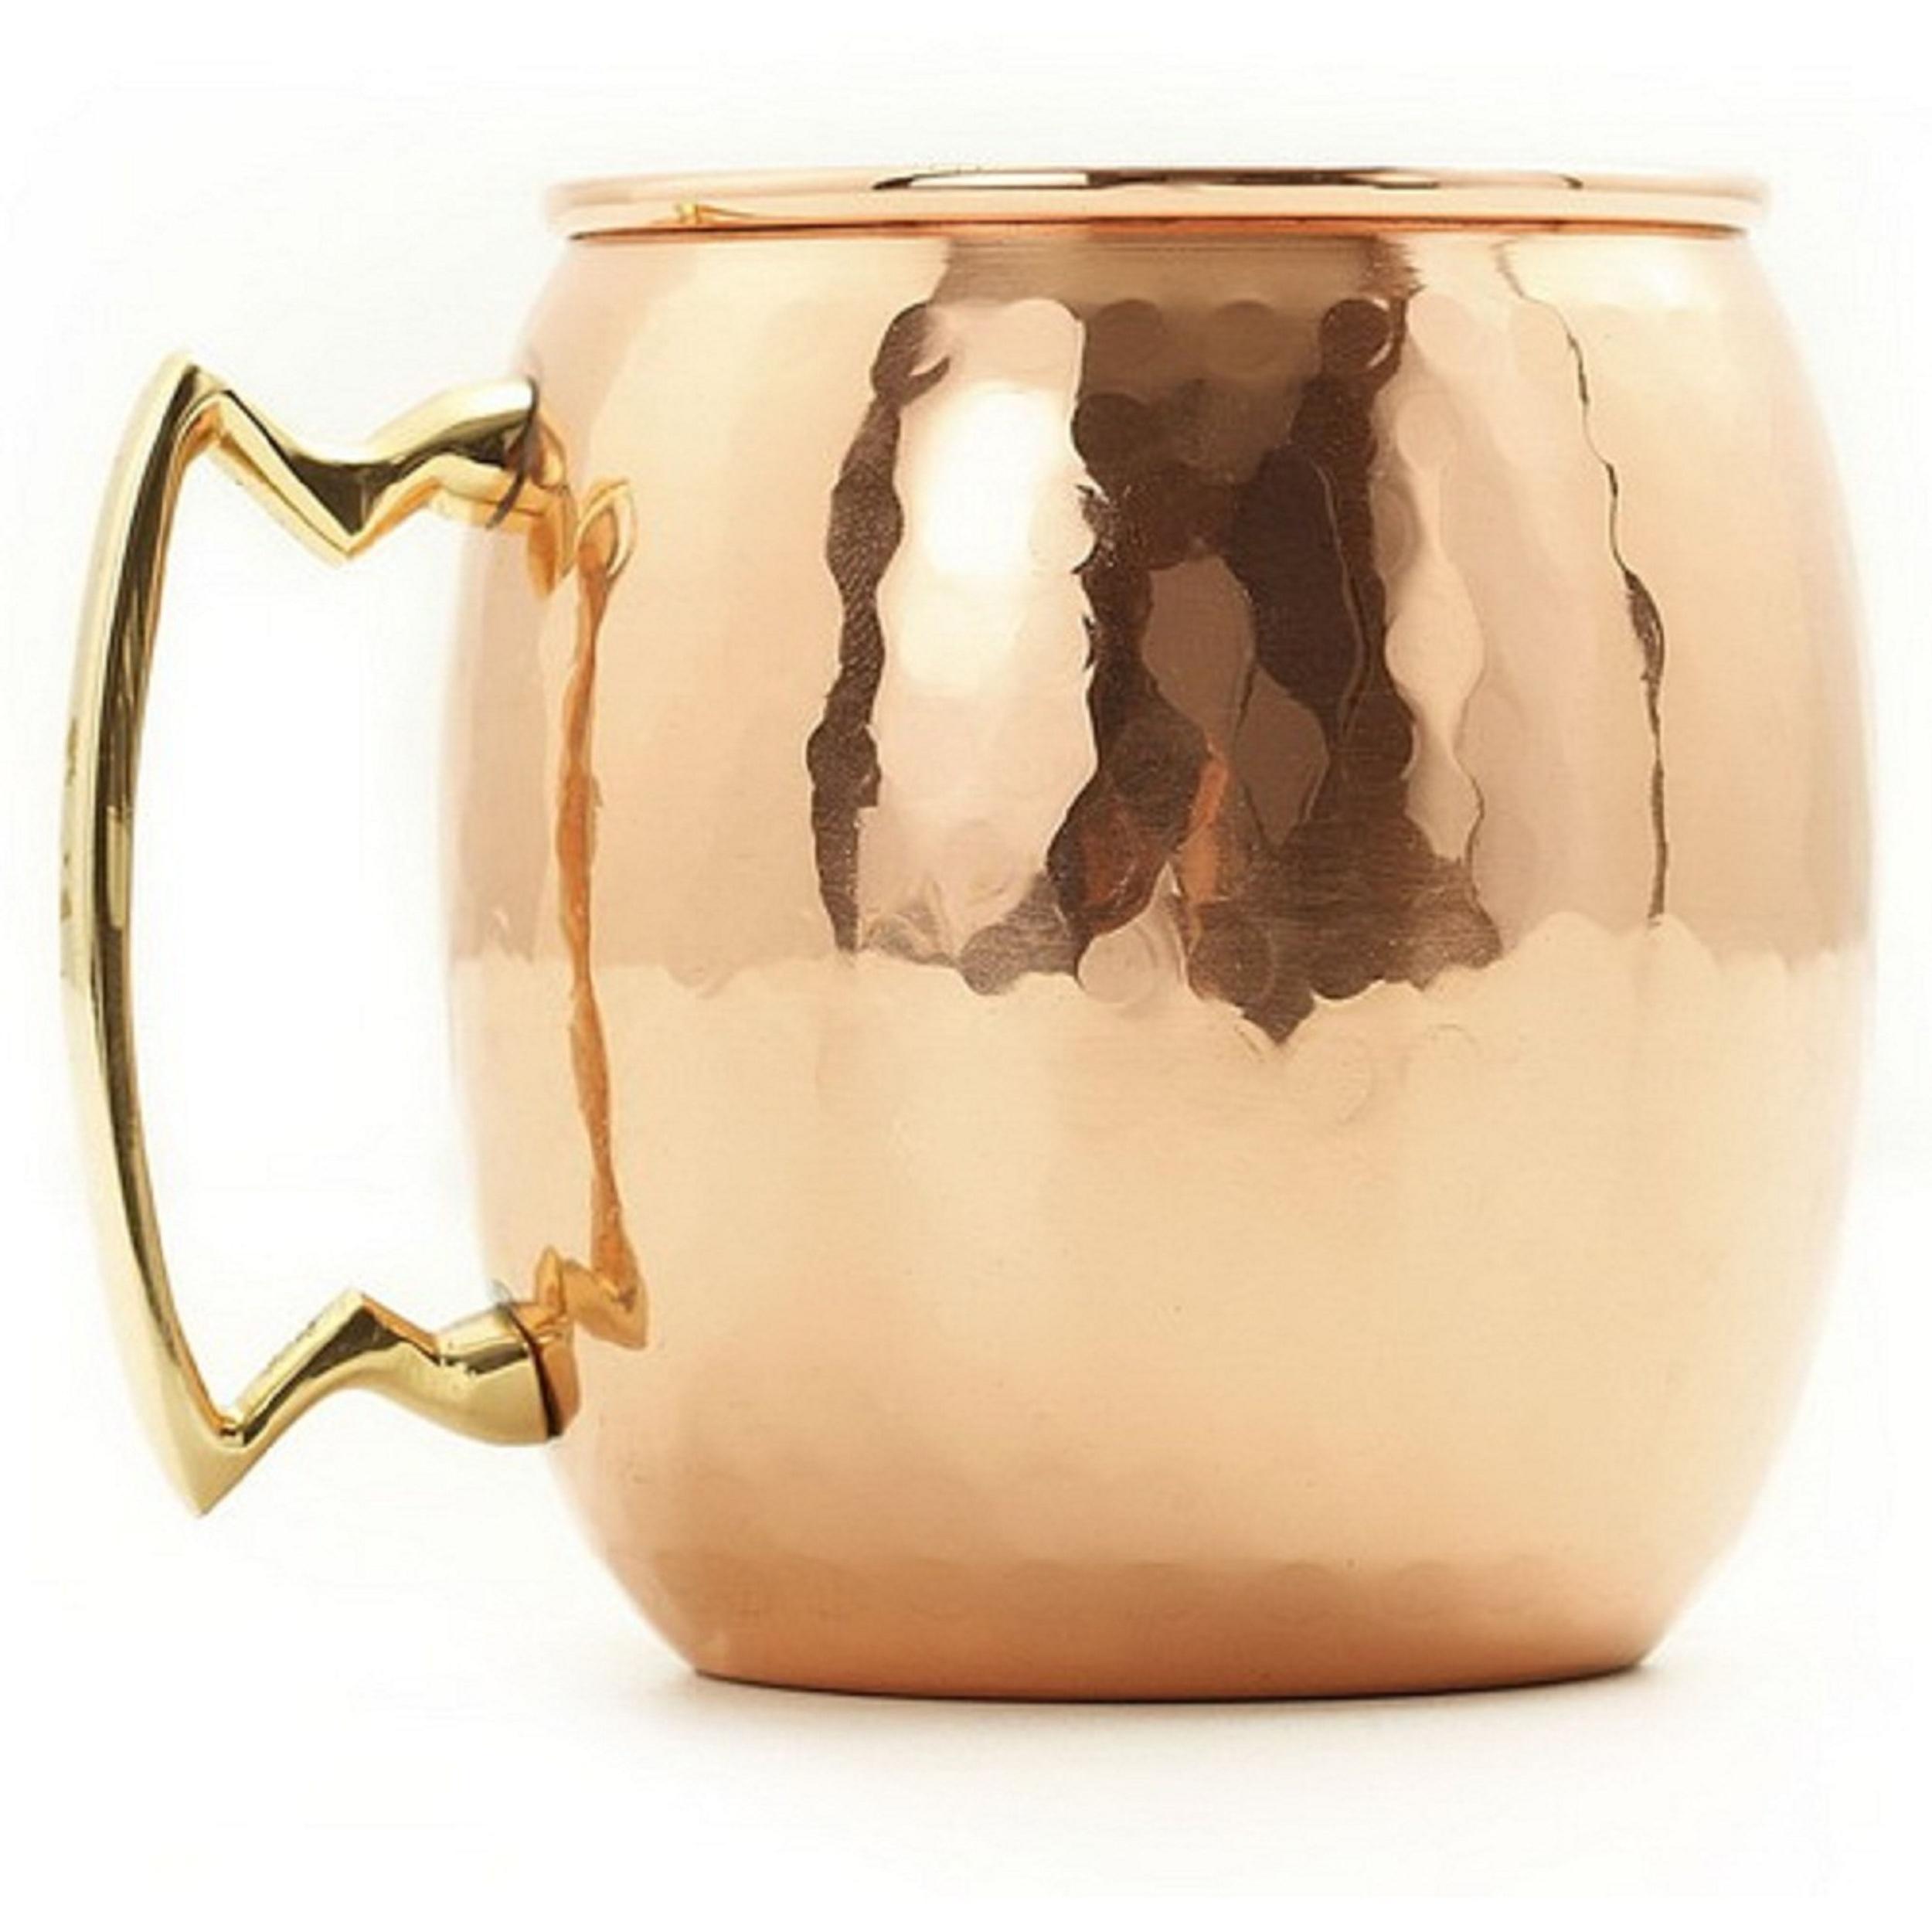 New Set of 4 Moscow Mule Mugs Hammered Copper Brass 16 Ounce oz Mug 500ml Bar